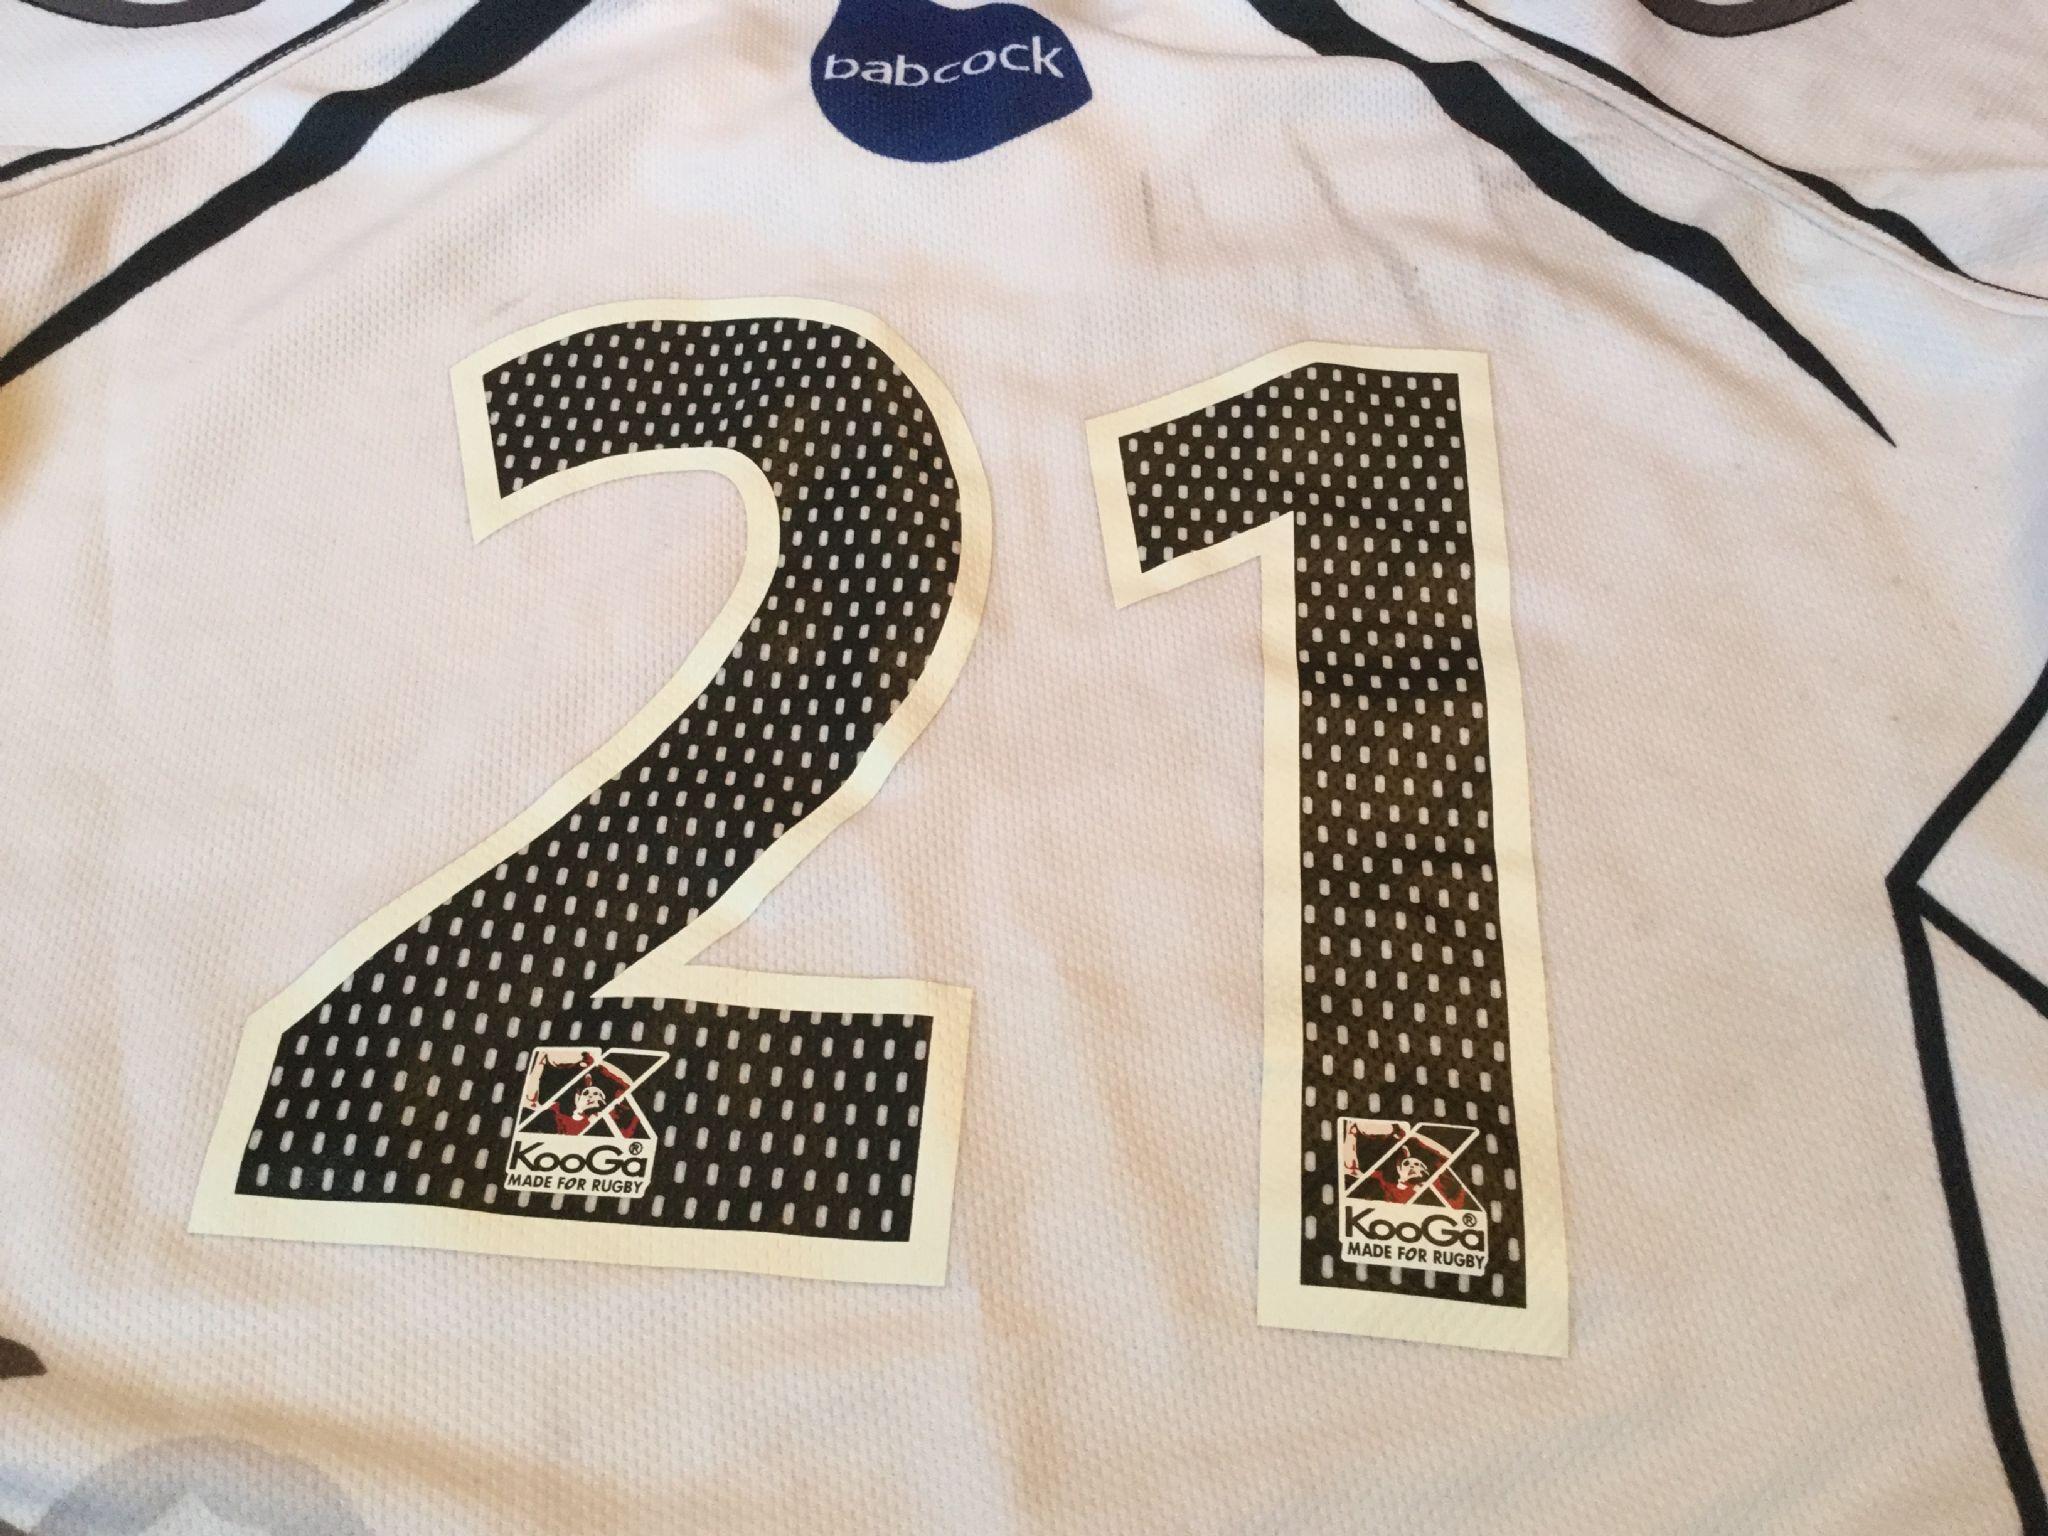 Design shirt kooga - Classic Rugby Shirts 2009 Royal Navy Vintage Old Jersey